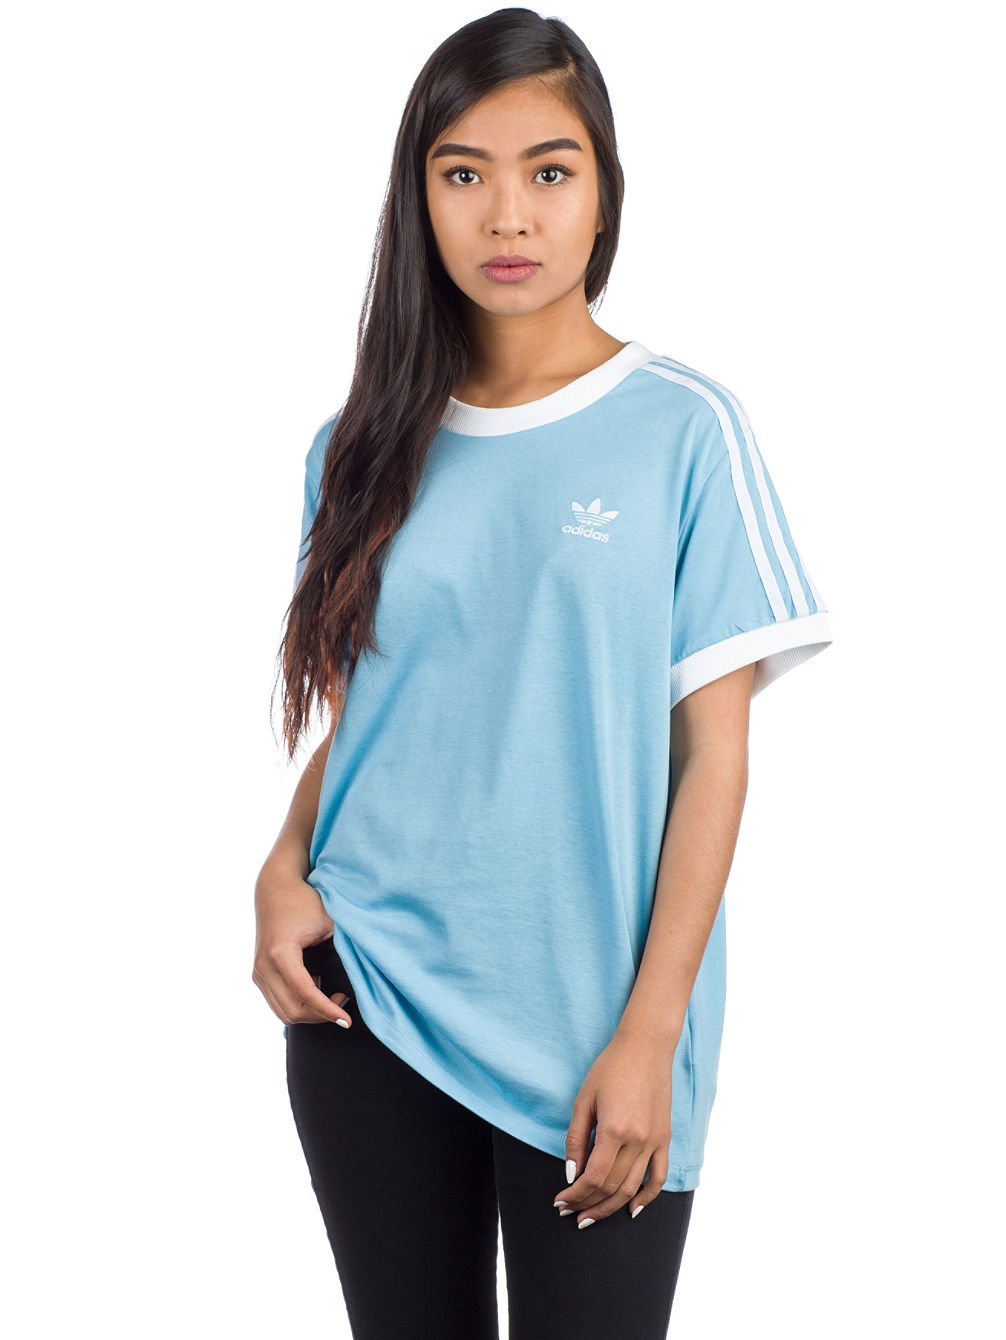 948ff6a80 Compra adidas Originals 3 Stripes Camiseta en línea en Blue Tomato